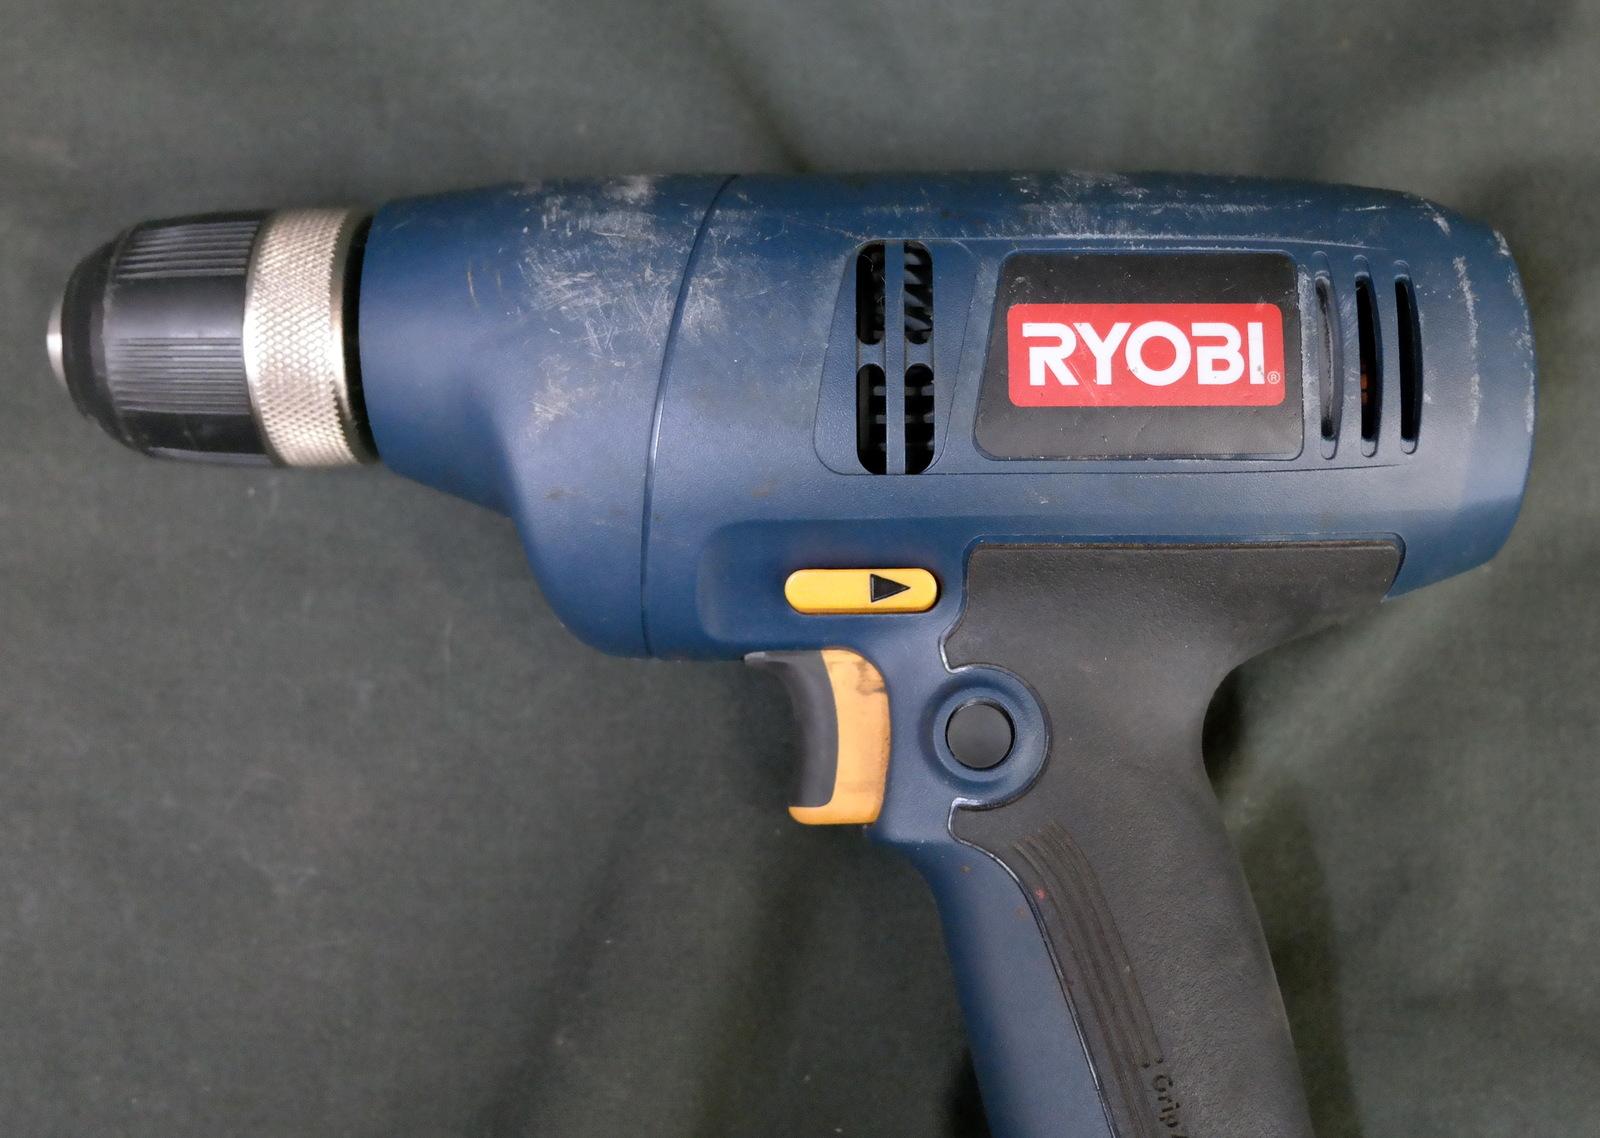 ryobi drill 19 listings rh bonanza com Ryobi Parts Ryobi Router Table Manual